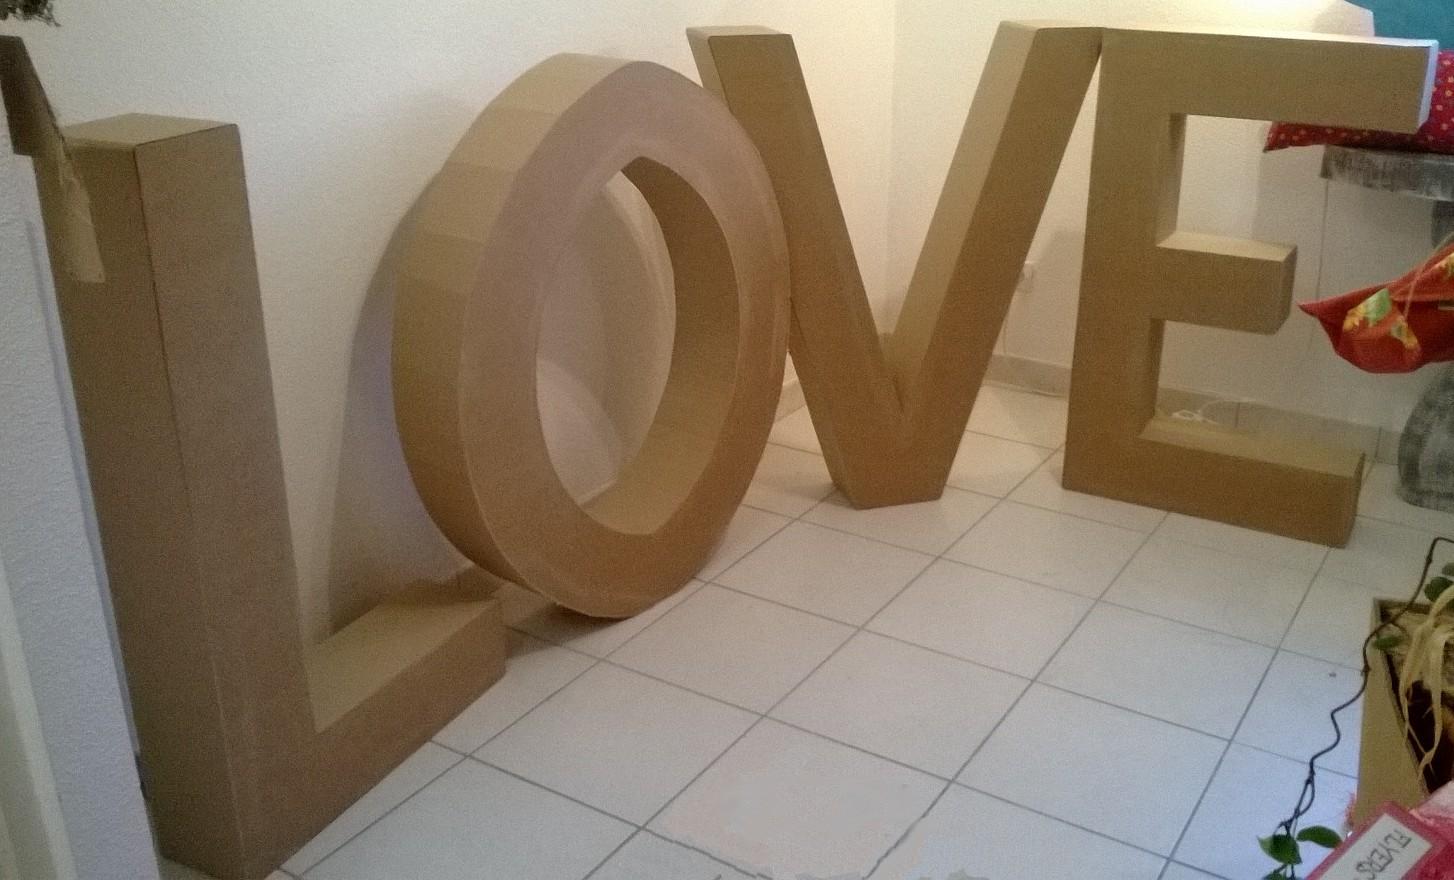 Grande lettre carton 1m stand party decoration de mariage candy bar cabin - Lettre en carton geante ...